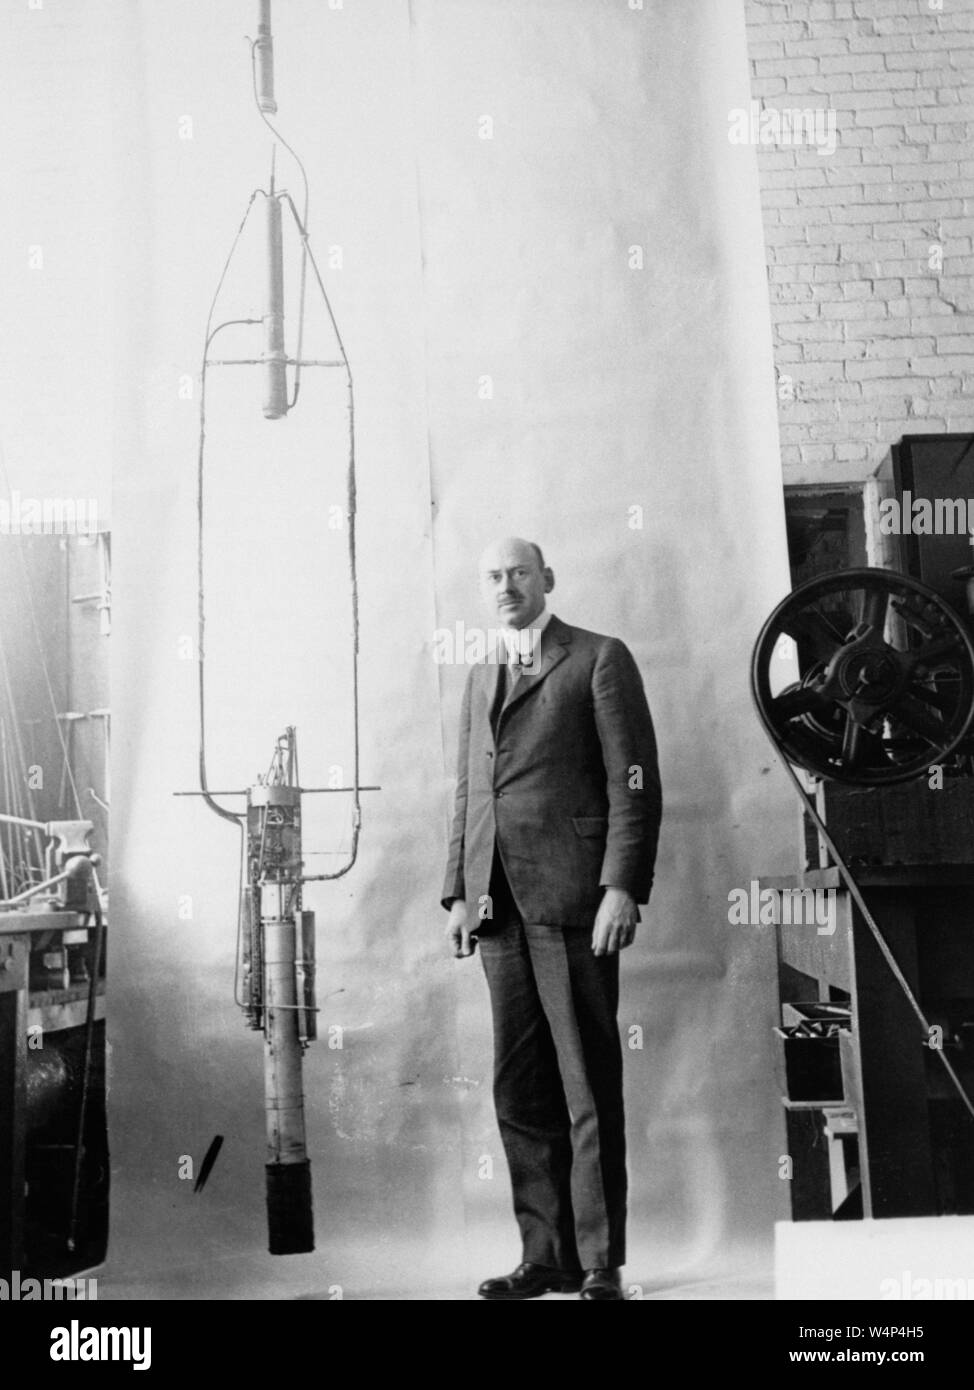 Robert Goddard Rocket Stock Photos & Robert Goddard Rocket